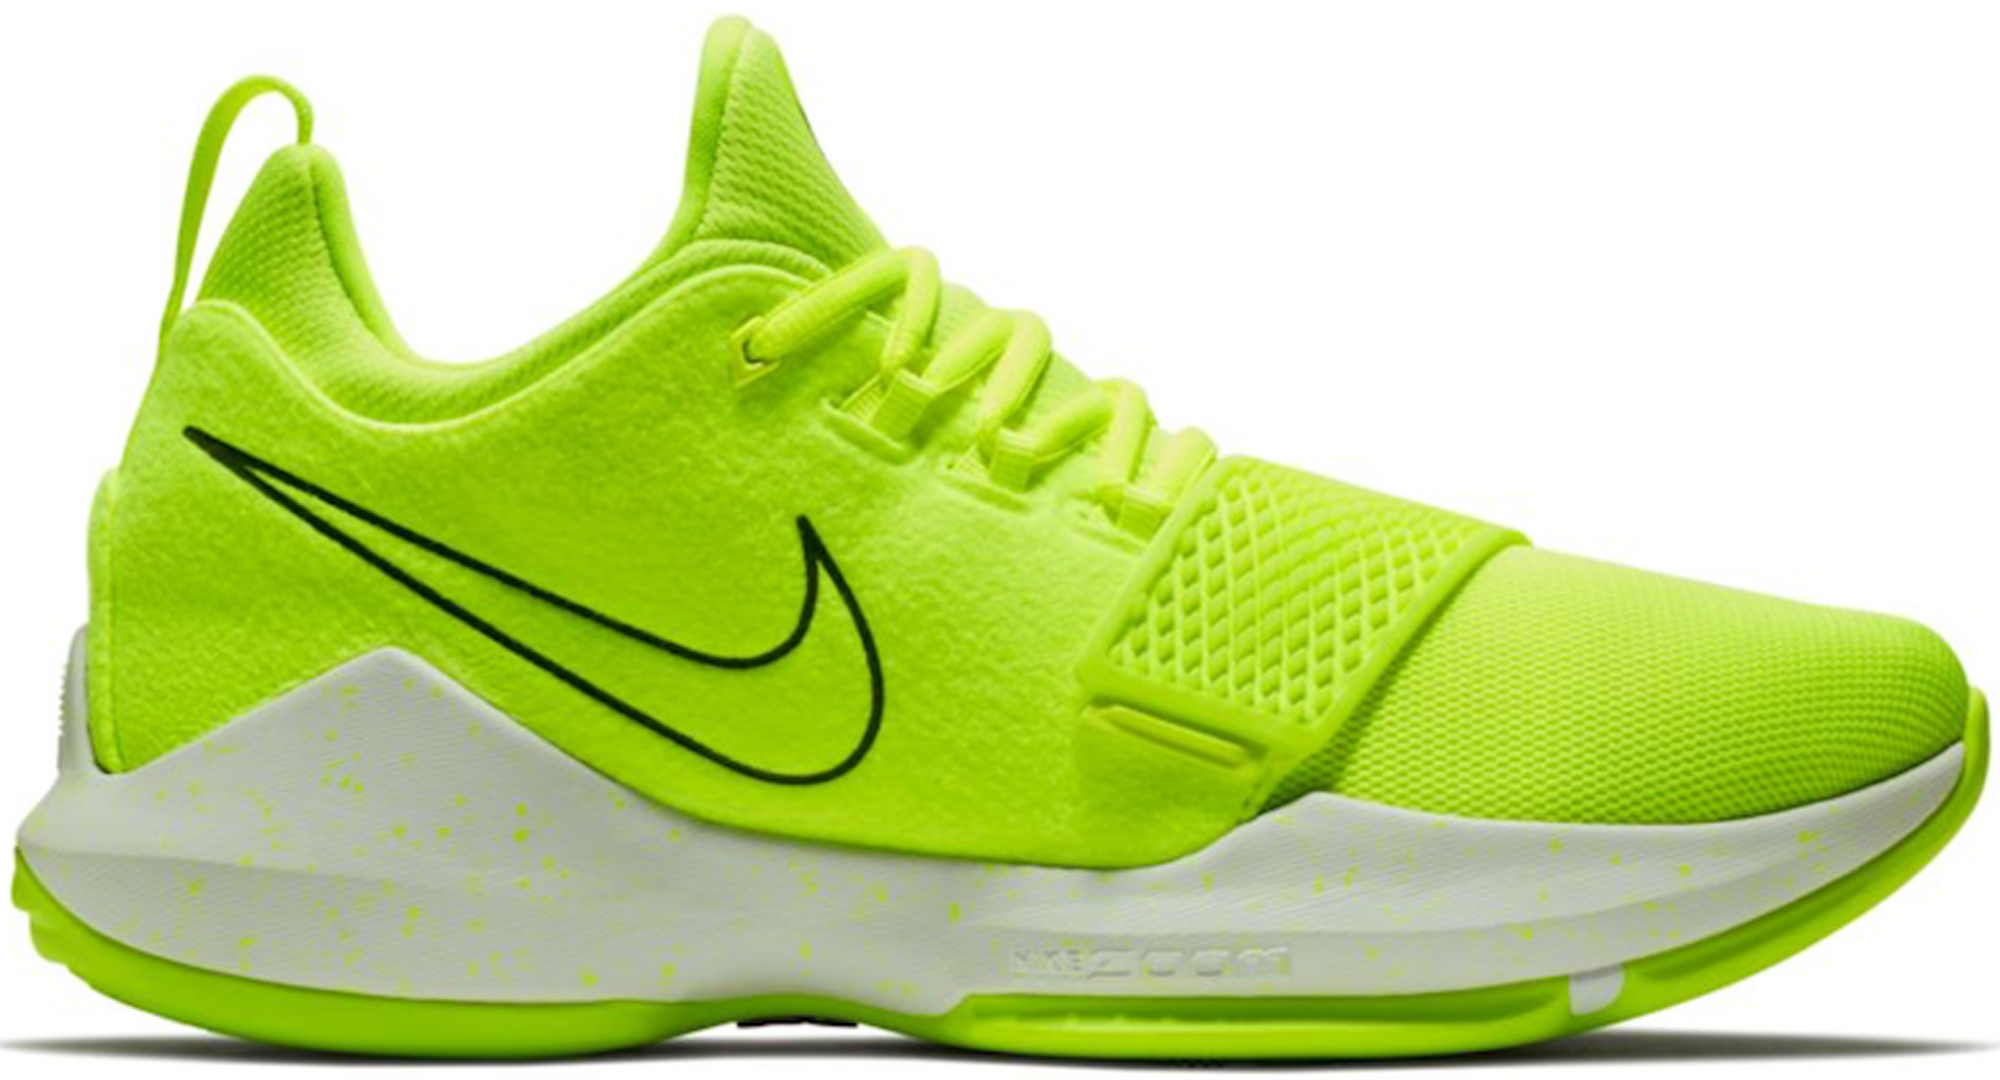 Nike PG 1 Volt